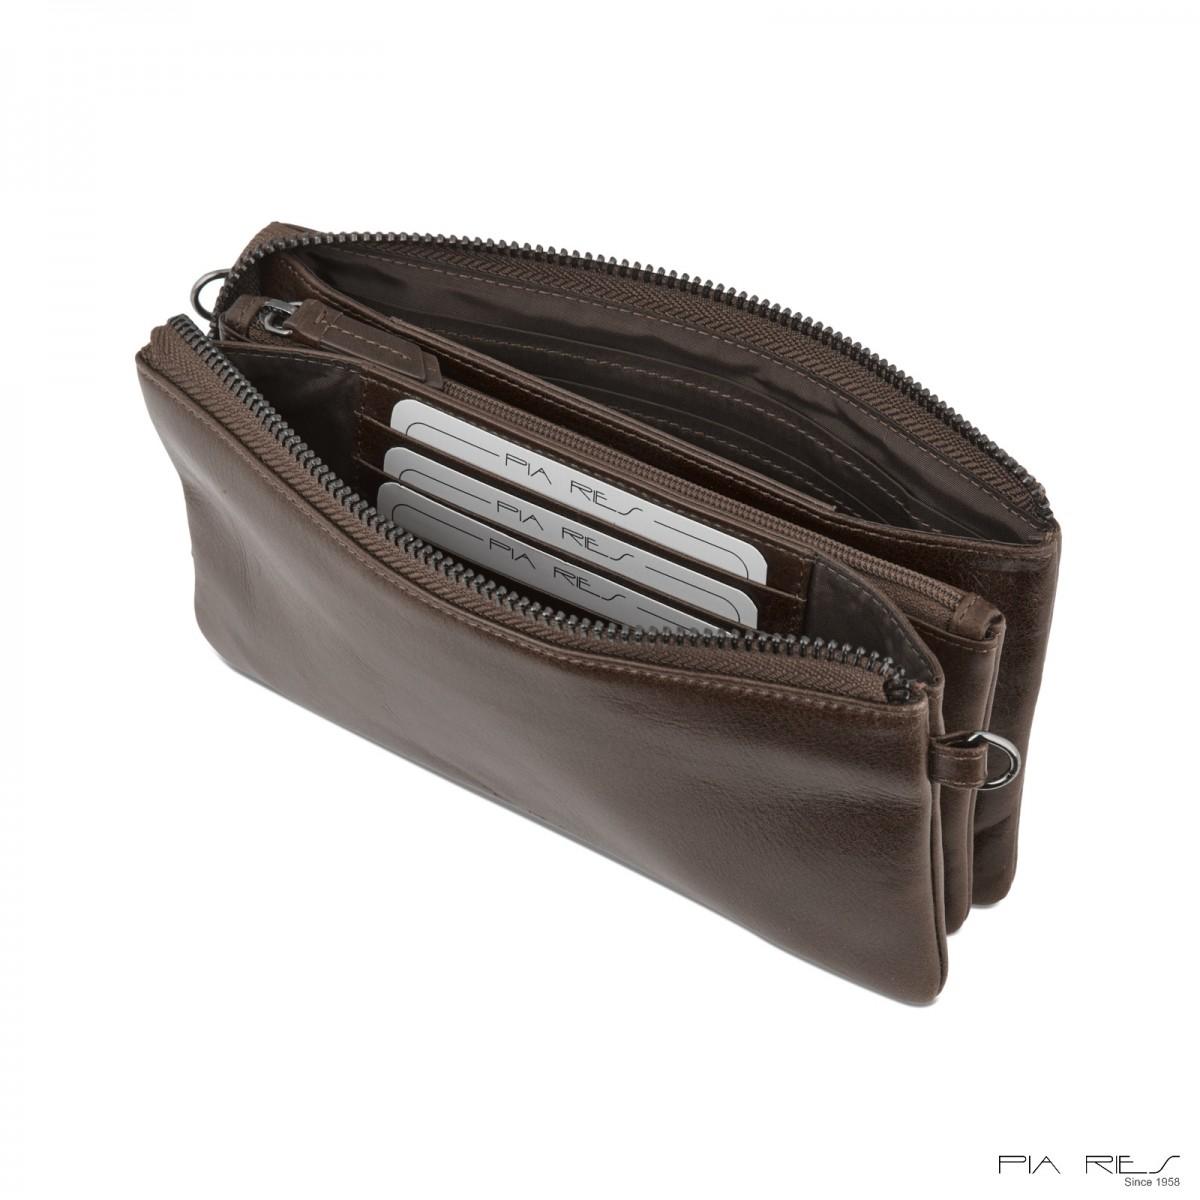 Clutch taske i Rain Crunch skind-Gråbrun-33